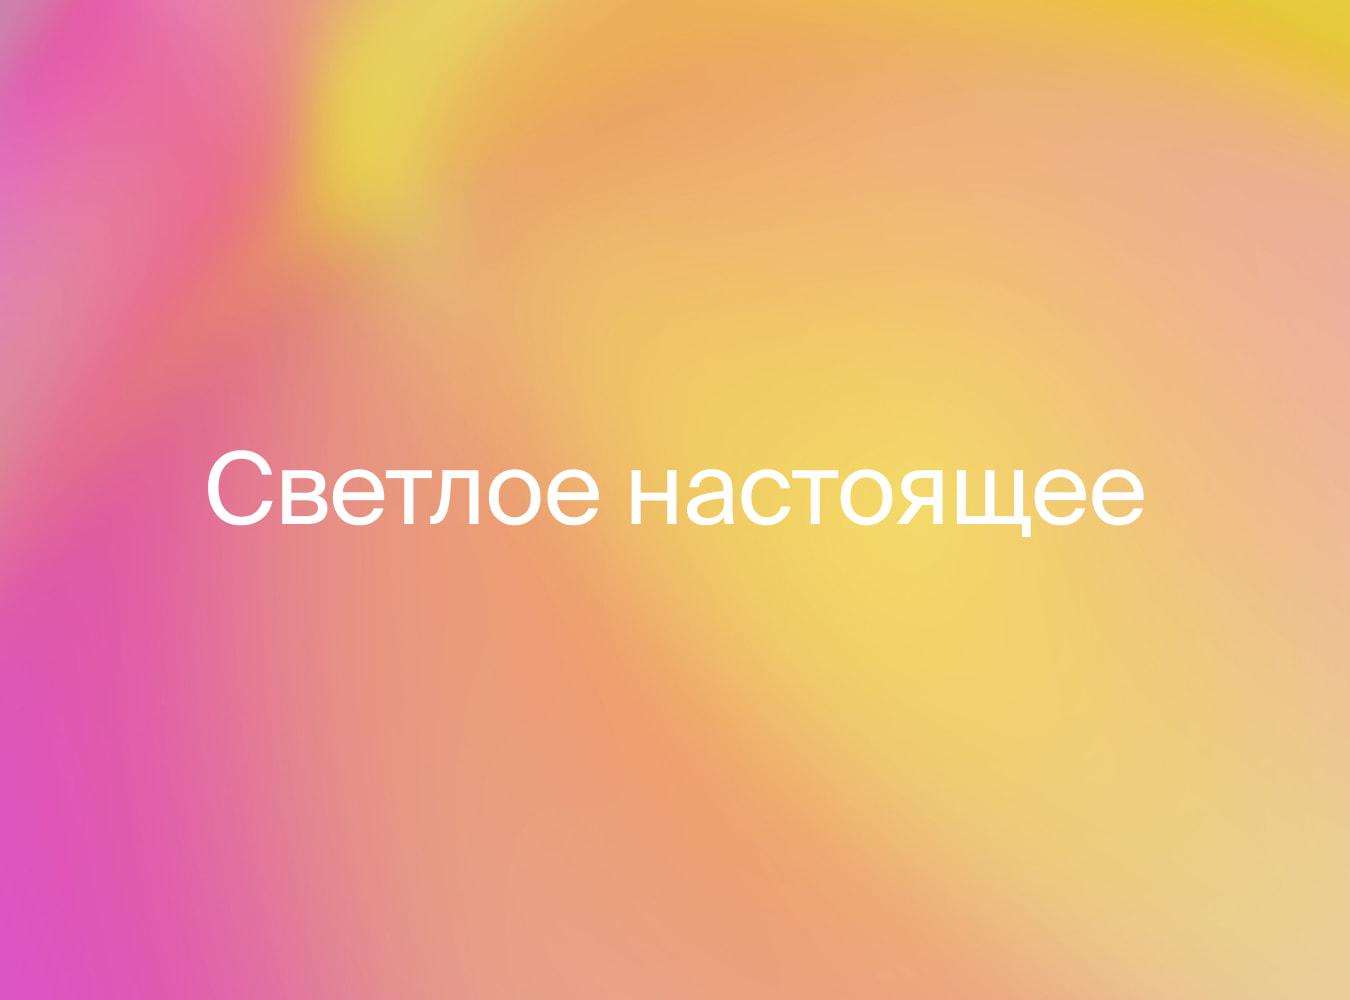 pz_03-1